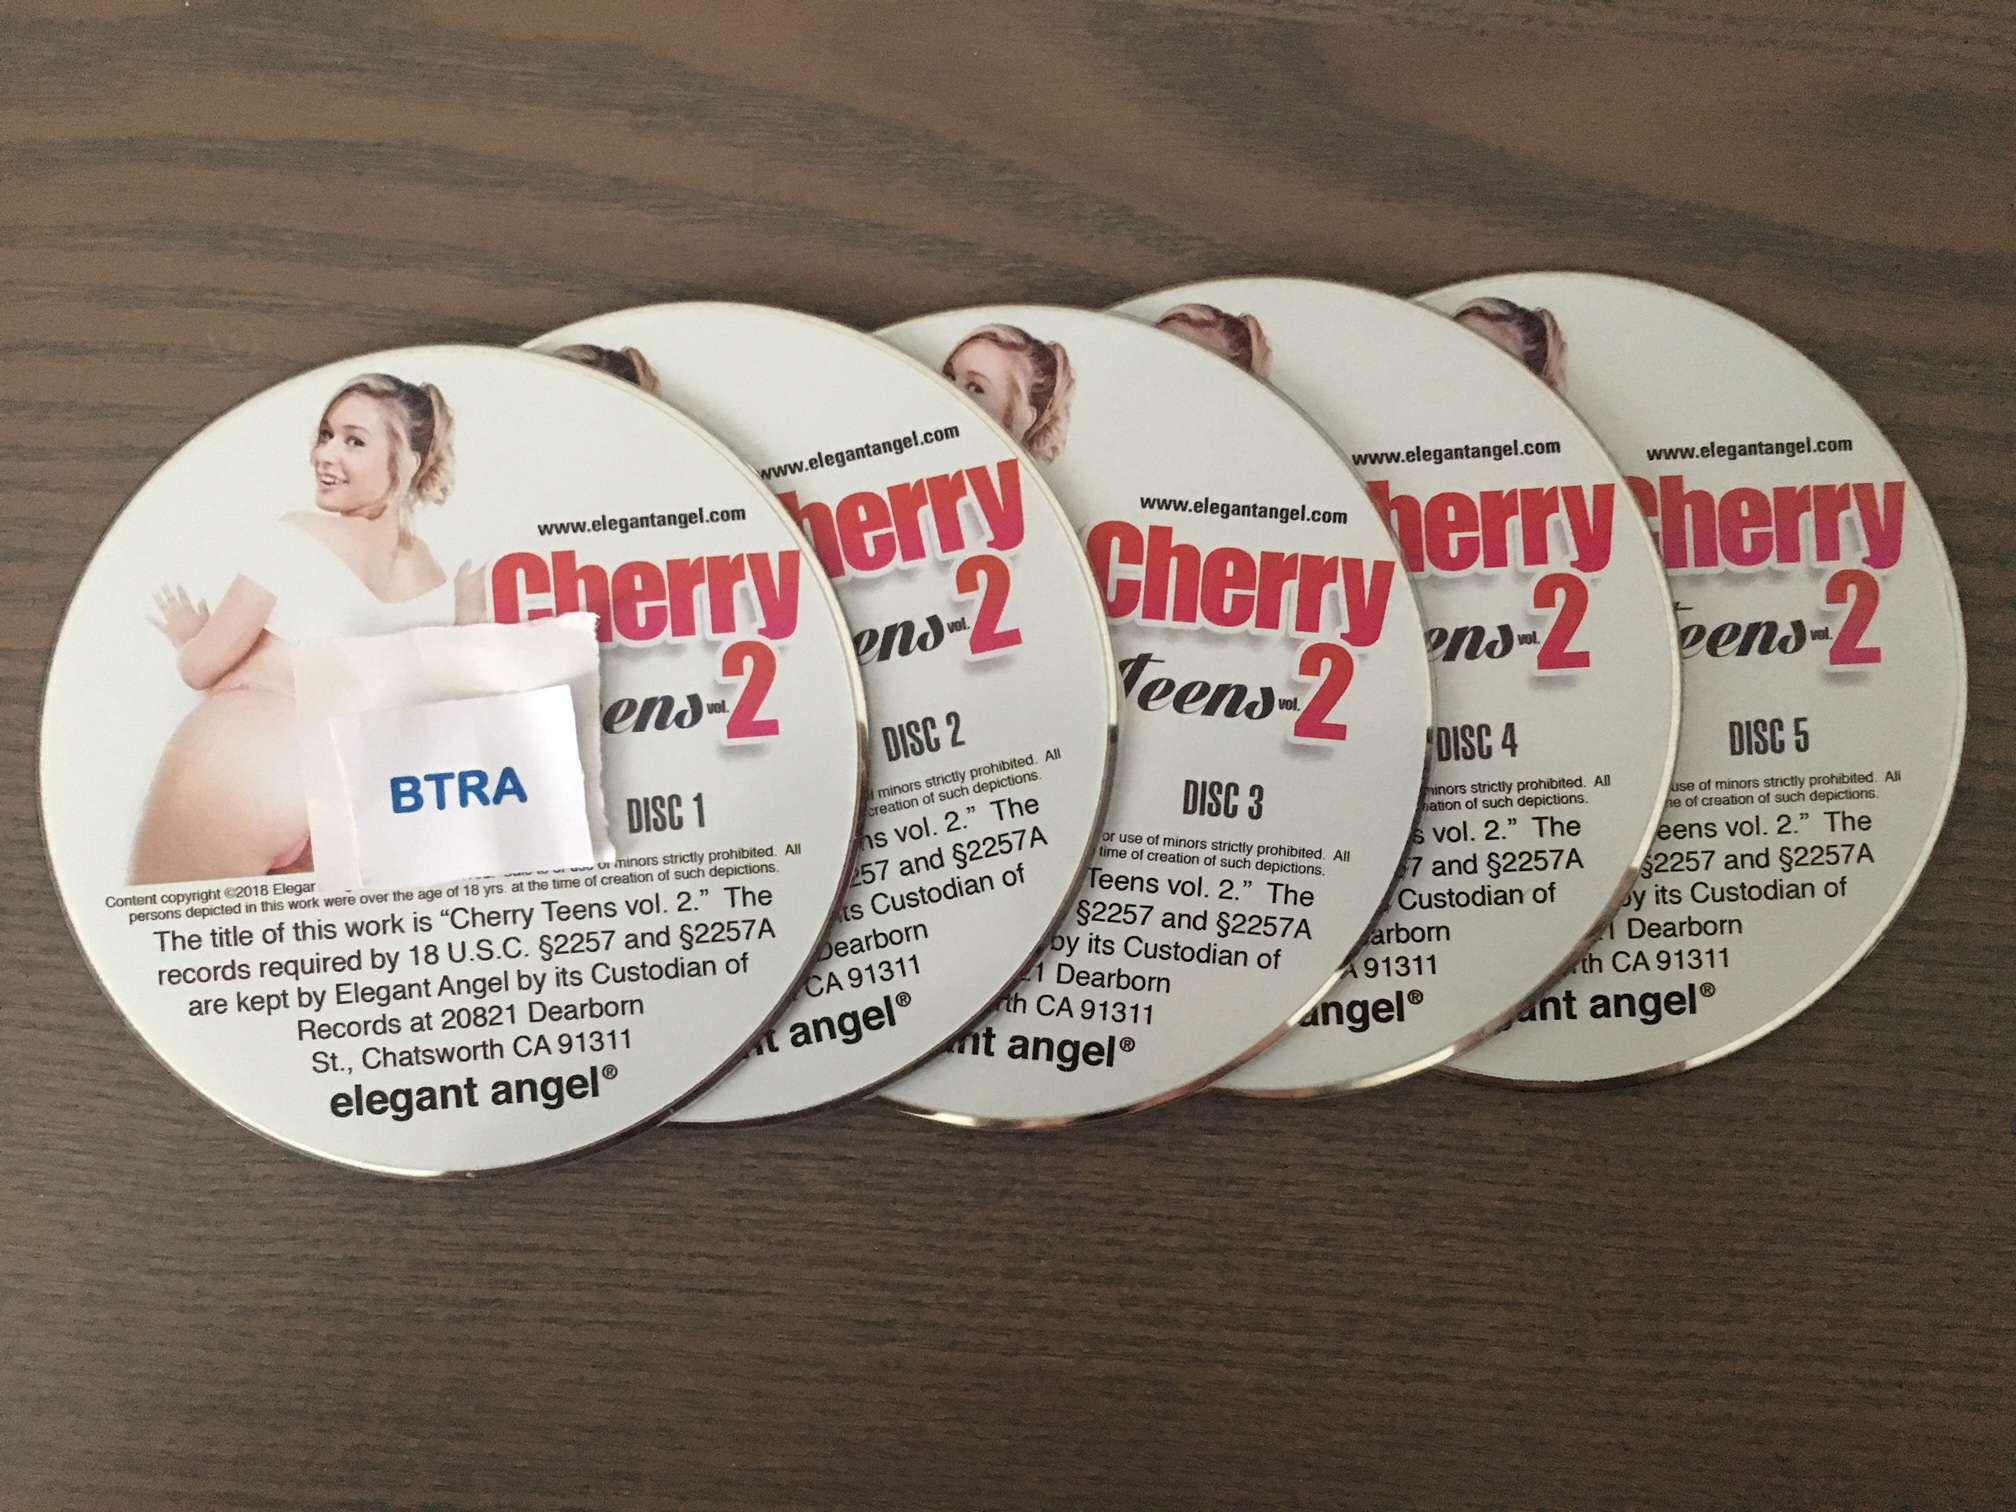 Cherry Teens 2 DiSC2 XXX DVDRip x264-BTRA